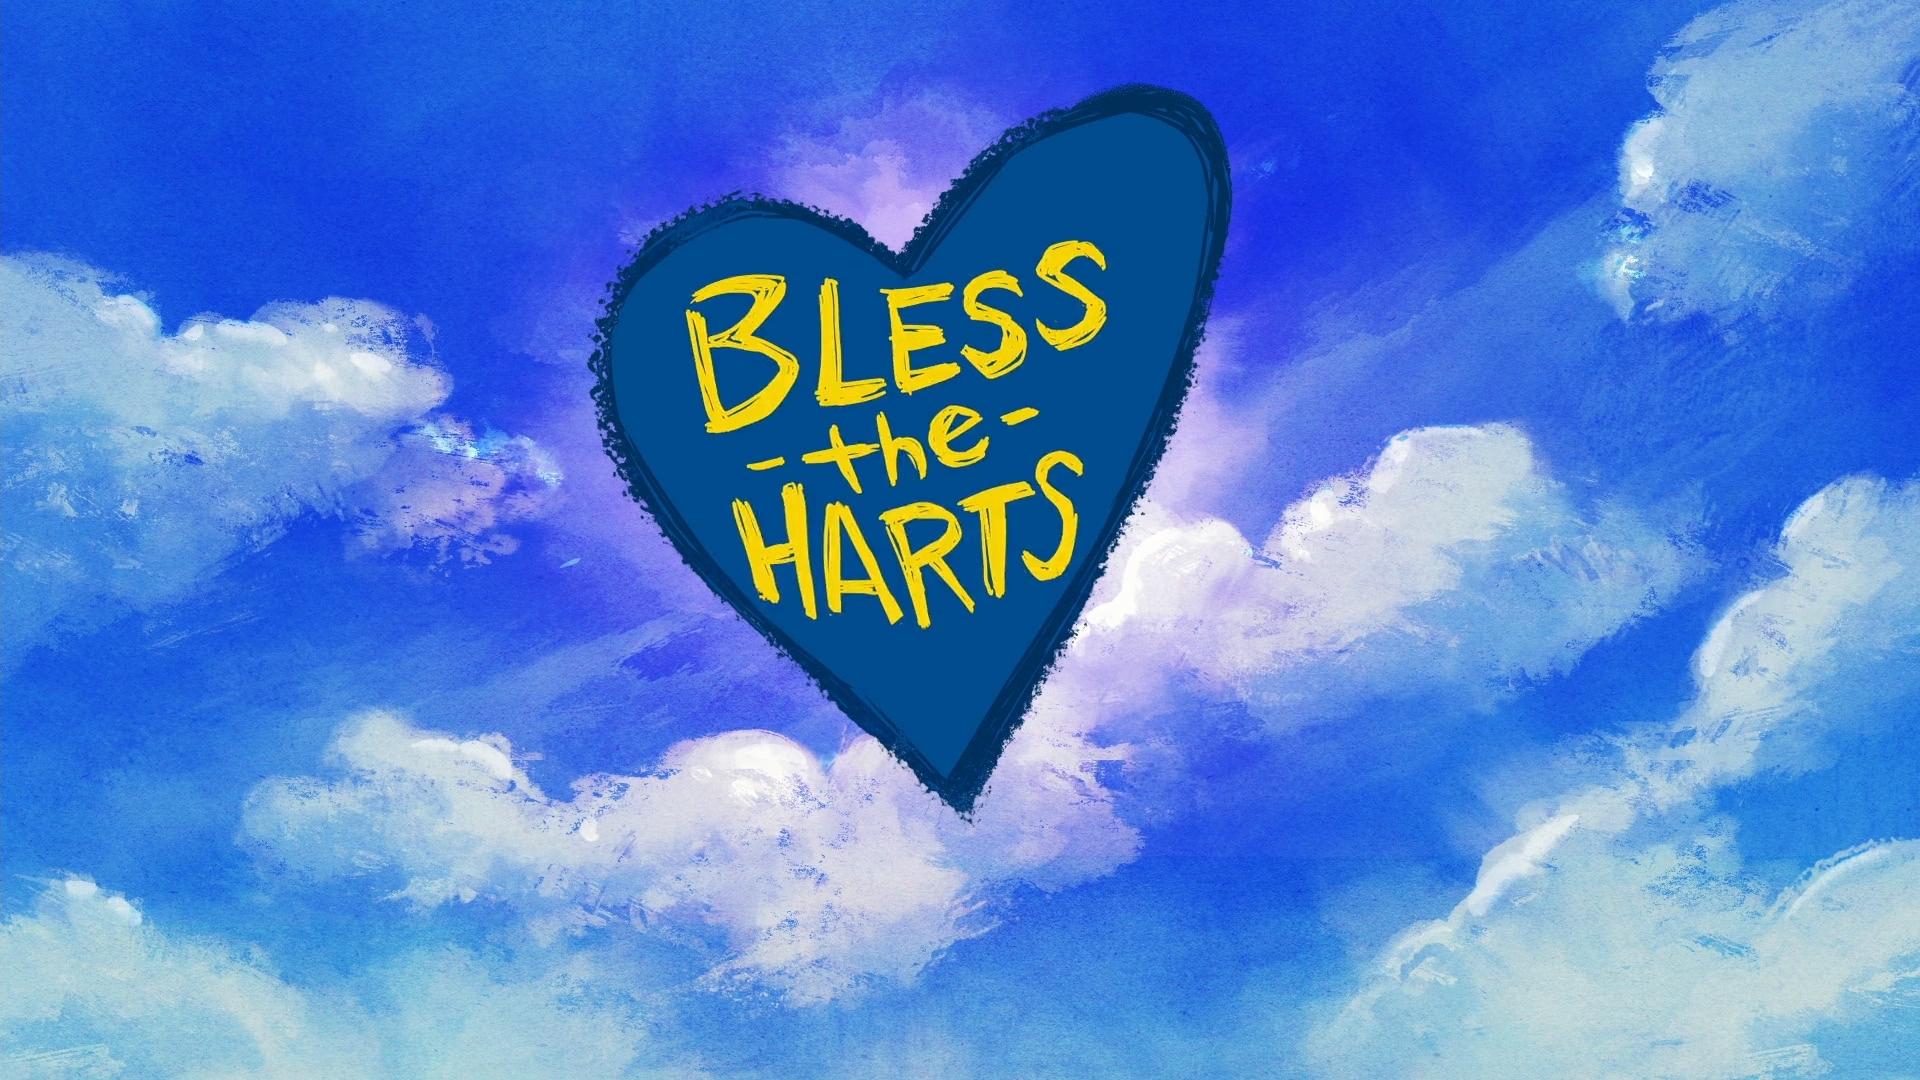 Bless the Harts Temporada 1 (2019) 1080p WEB-DL Latino